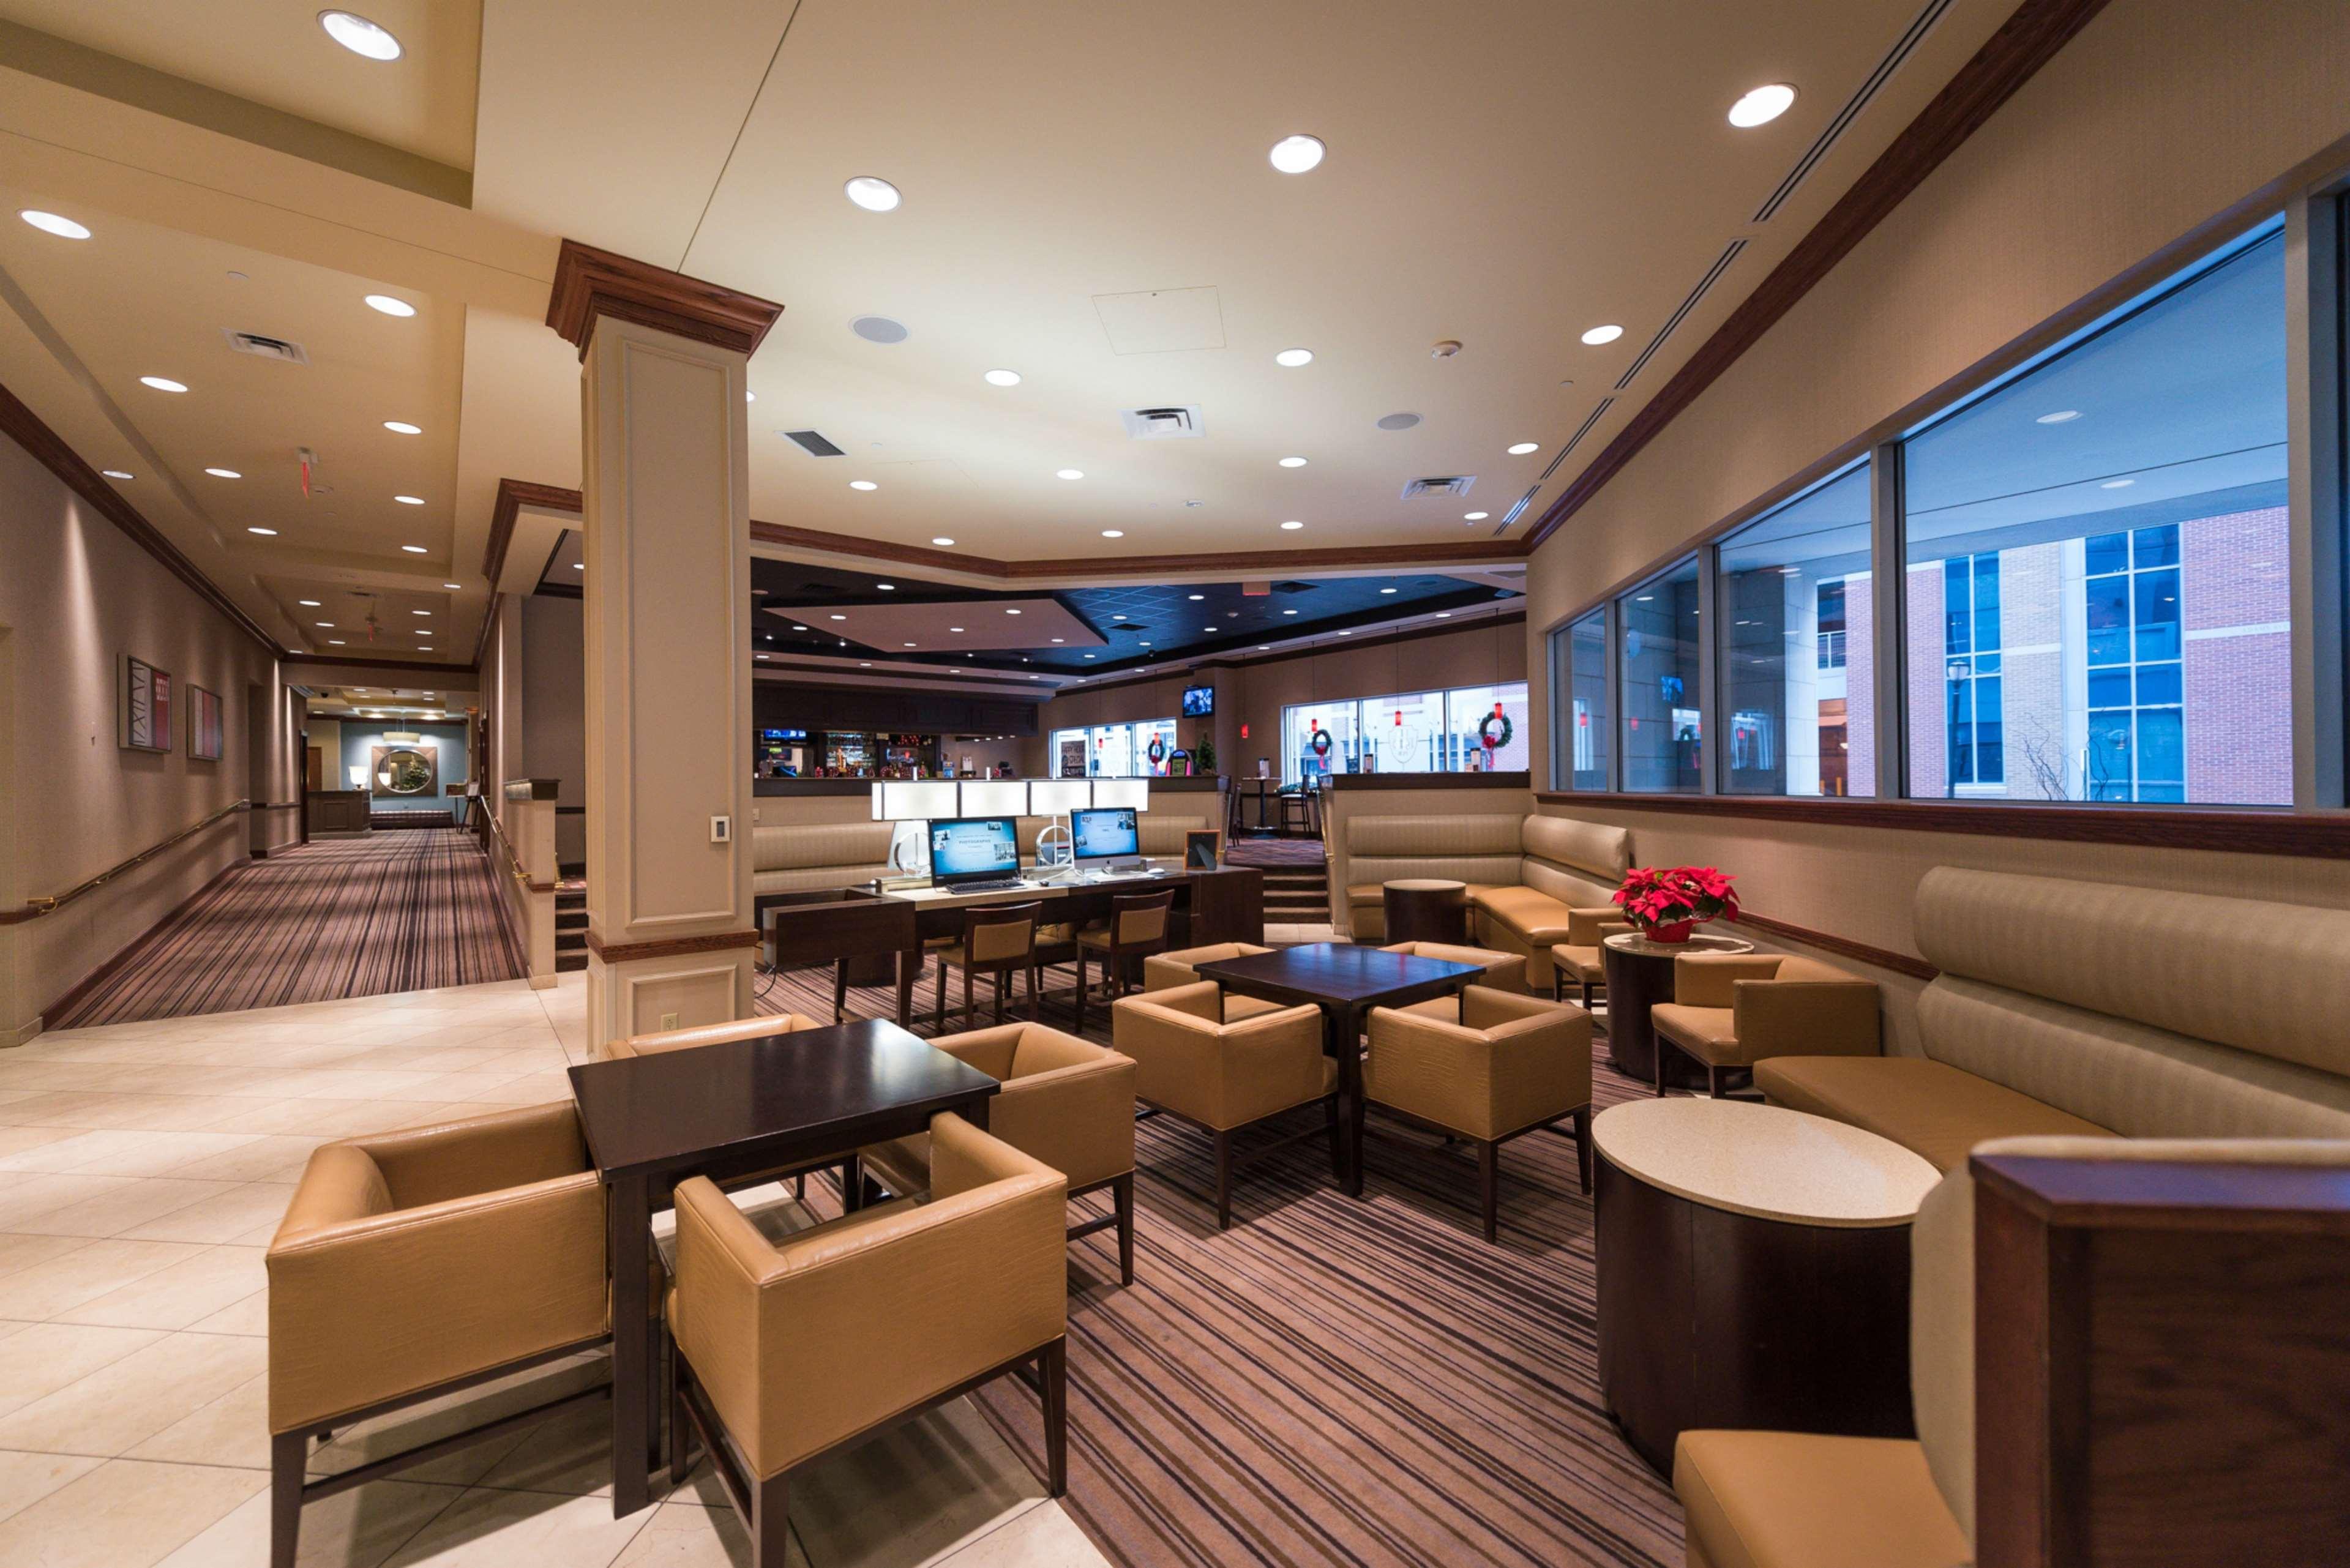 Hilton Scranton & Conference Center image 0